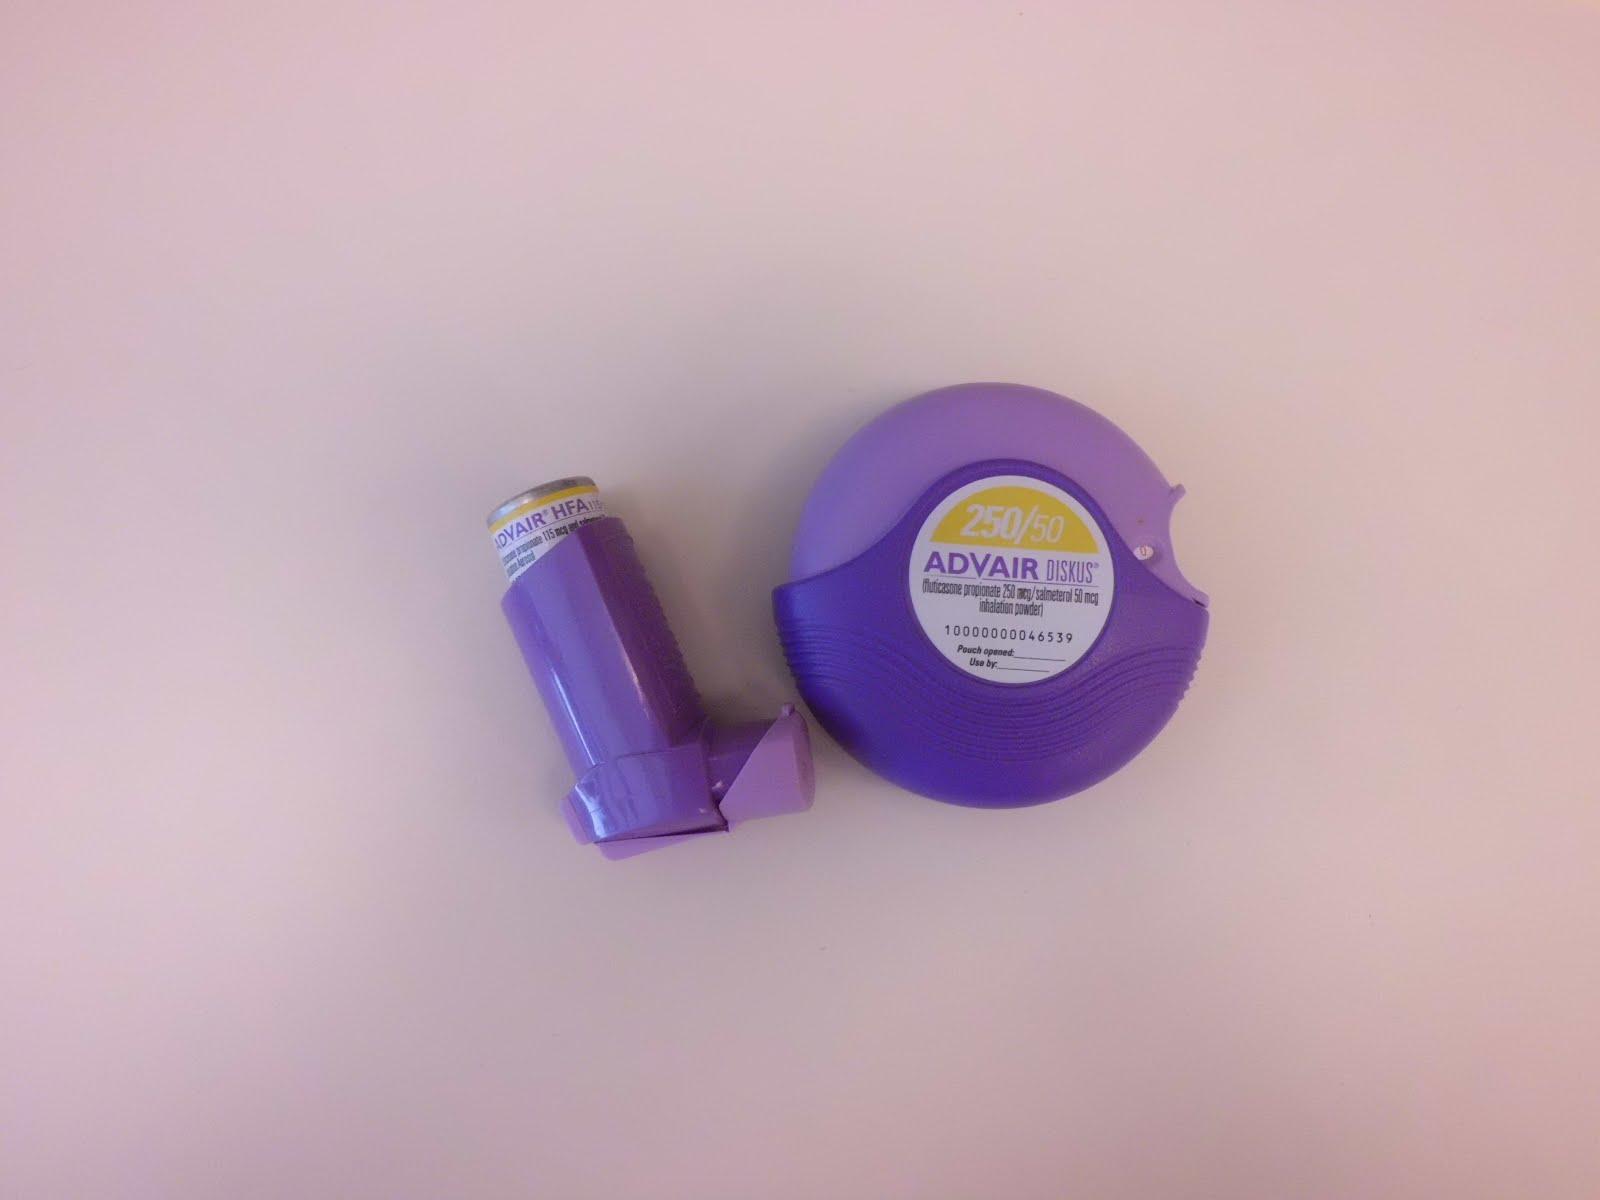 My Life As An Asthma Mom Advair Inhaler Instead Of The Disc